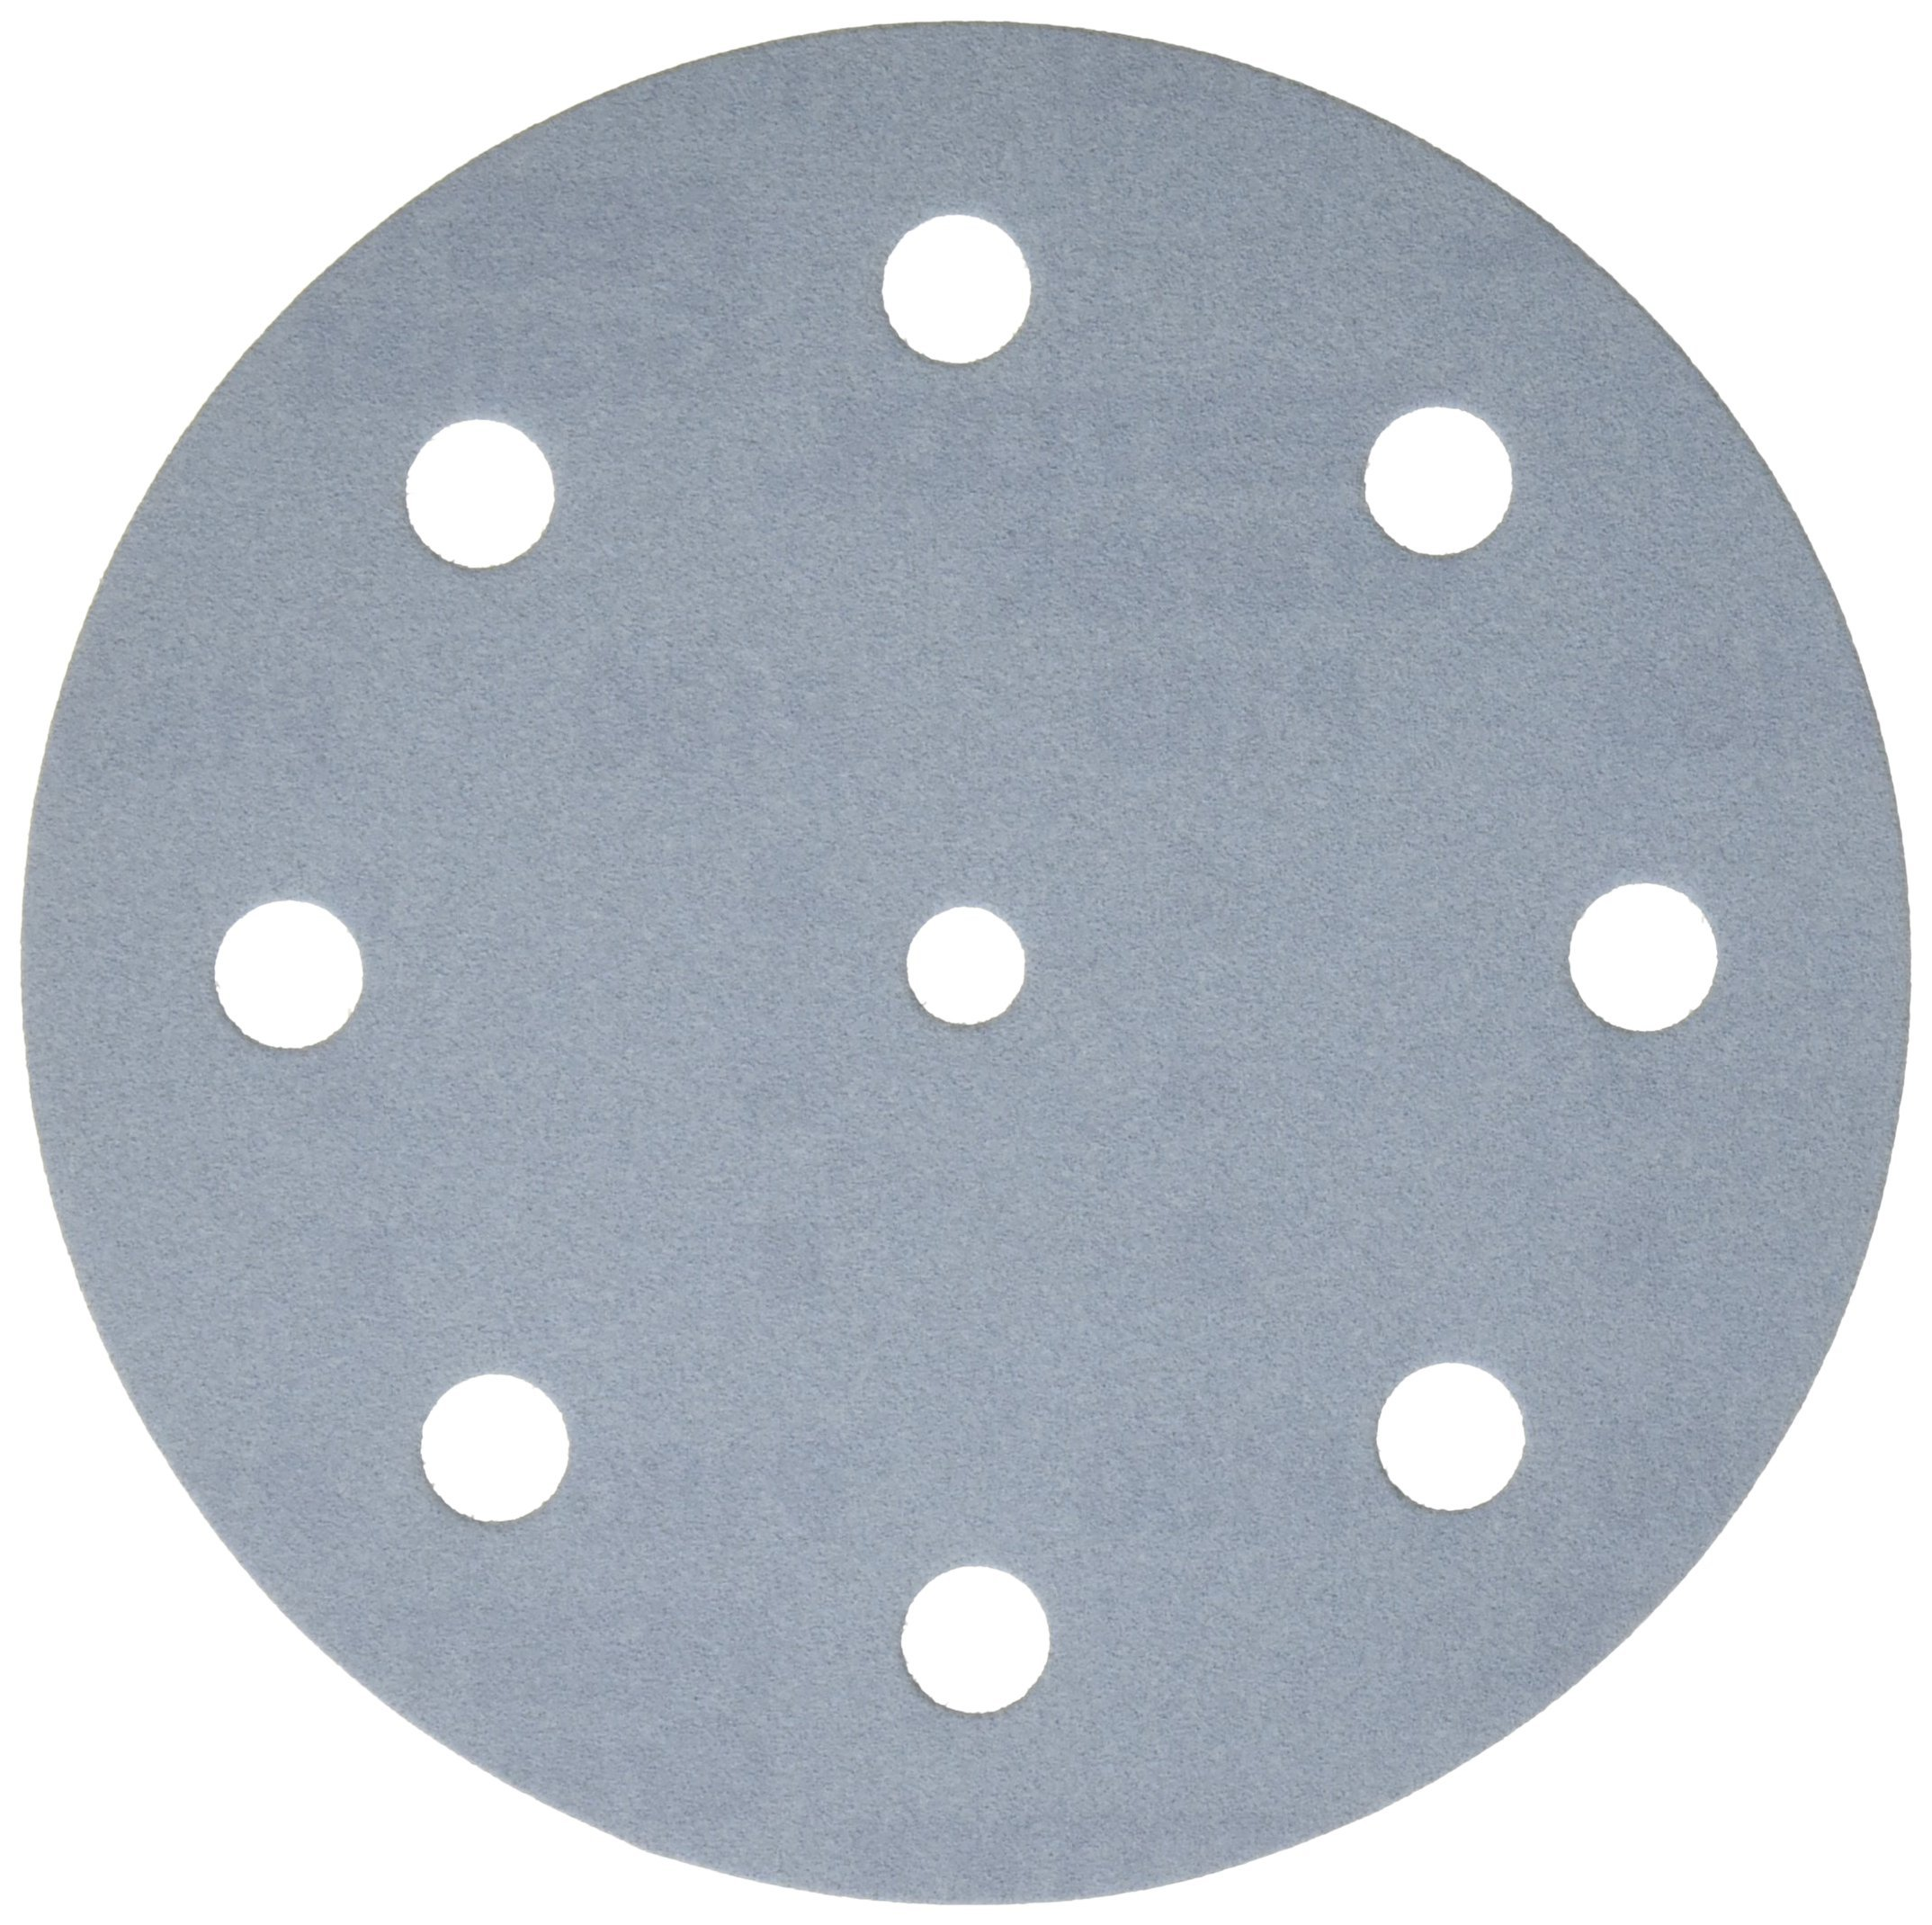 Festool 497149 P180 Grit, Granat Abrasives, Pack of 10